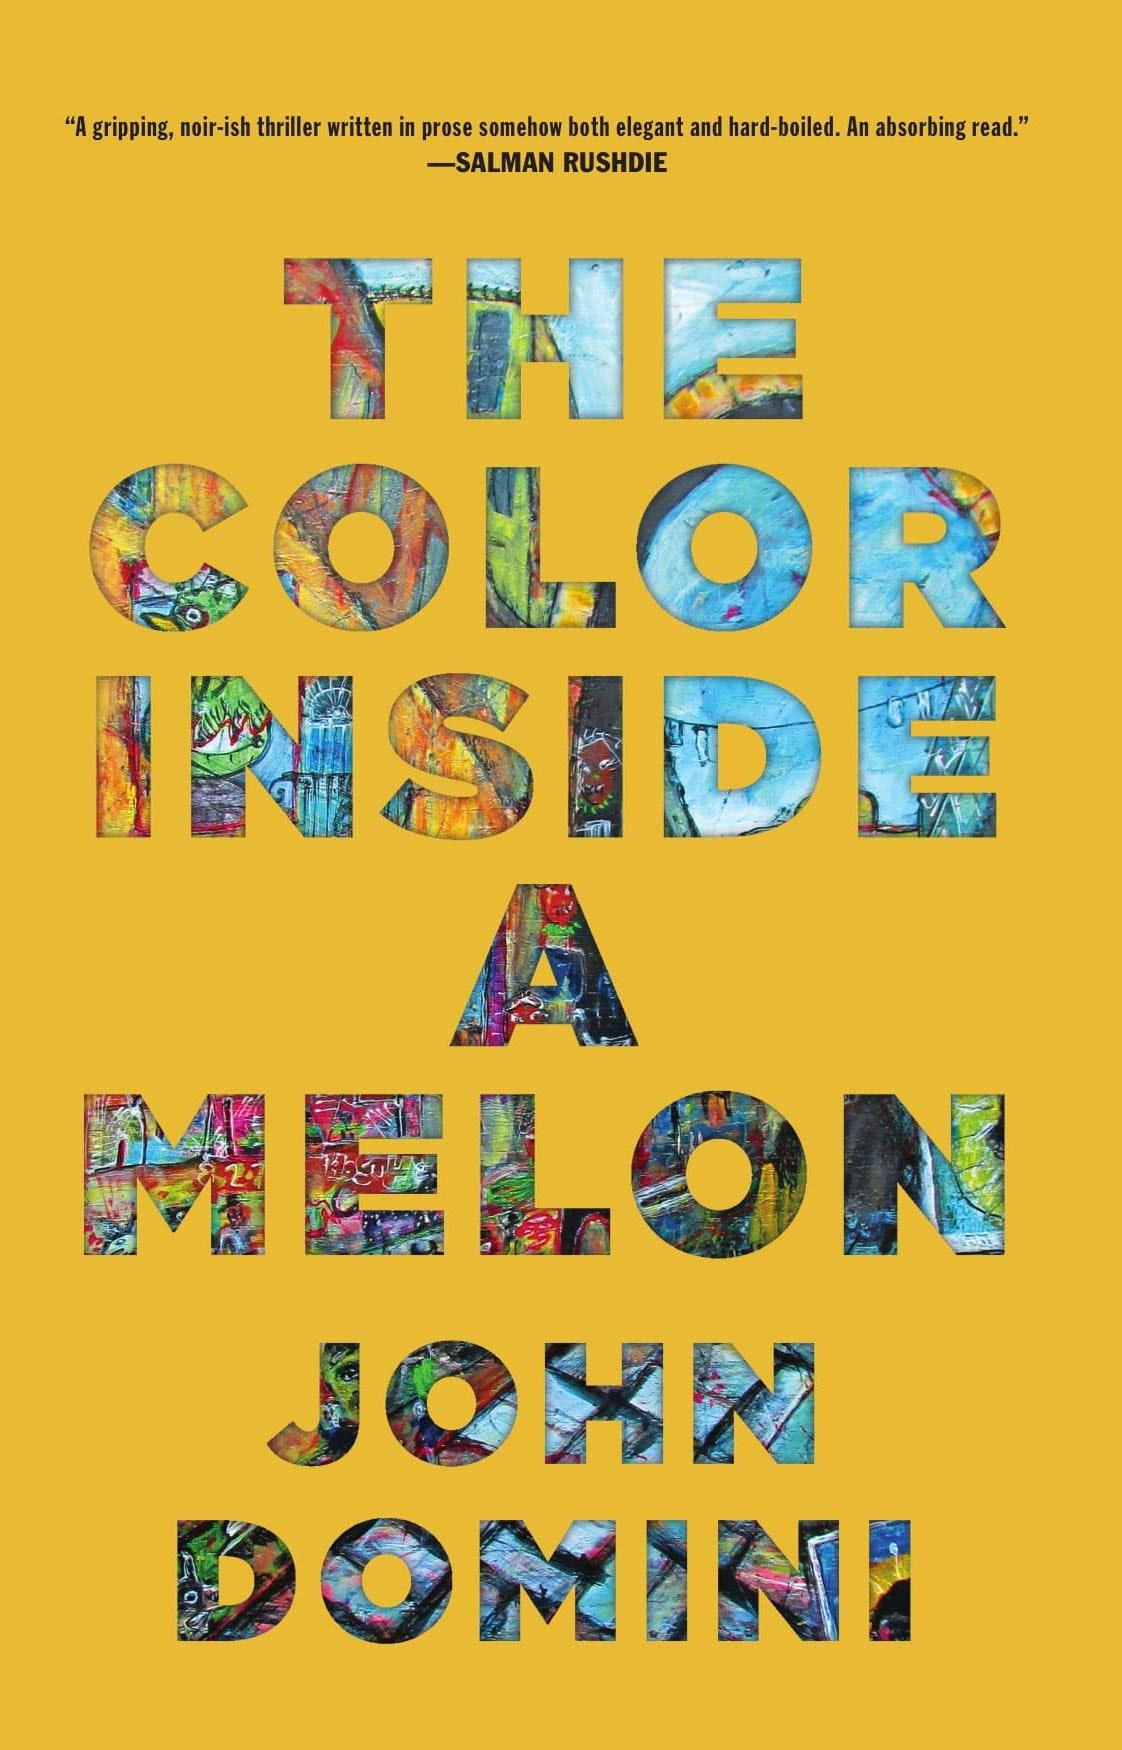 <em>The Color Inside a Melon</em></p><p>by John Domini</p><p>Dzanc, 2019</p>